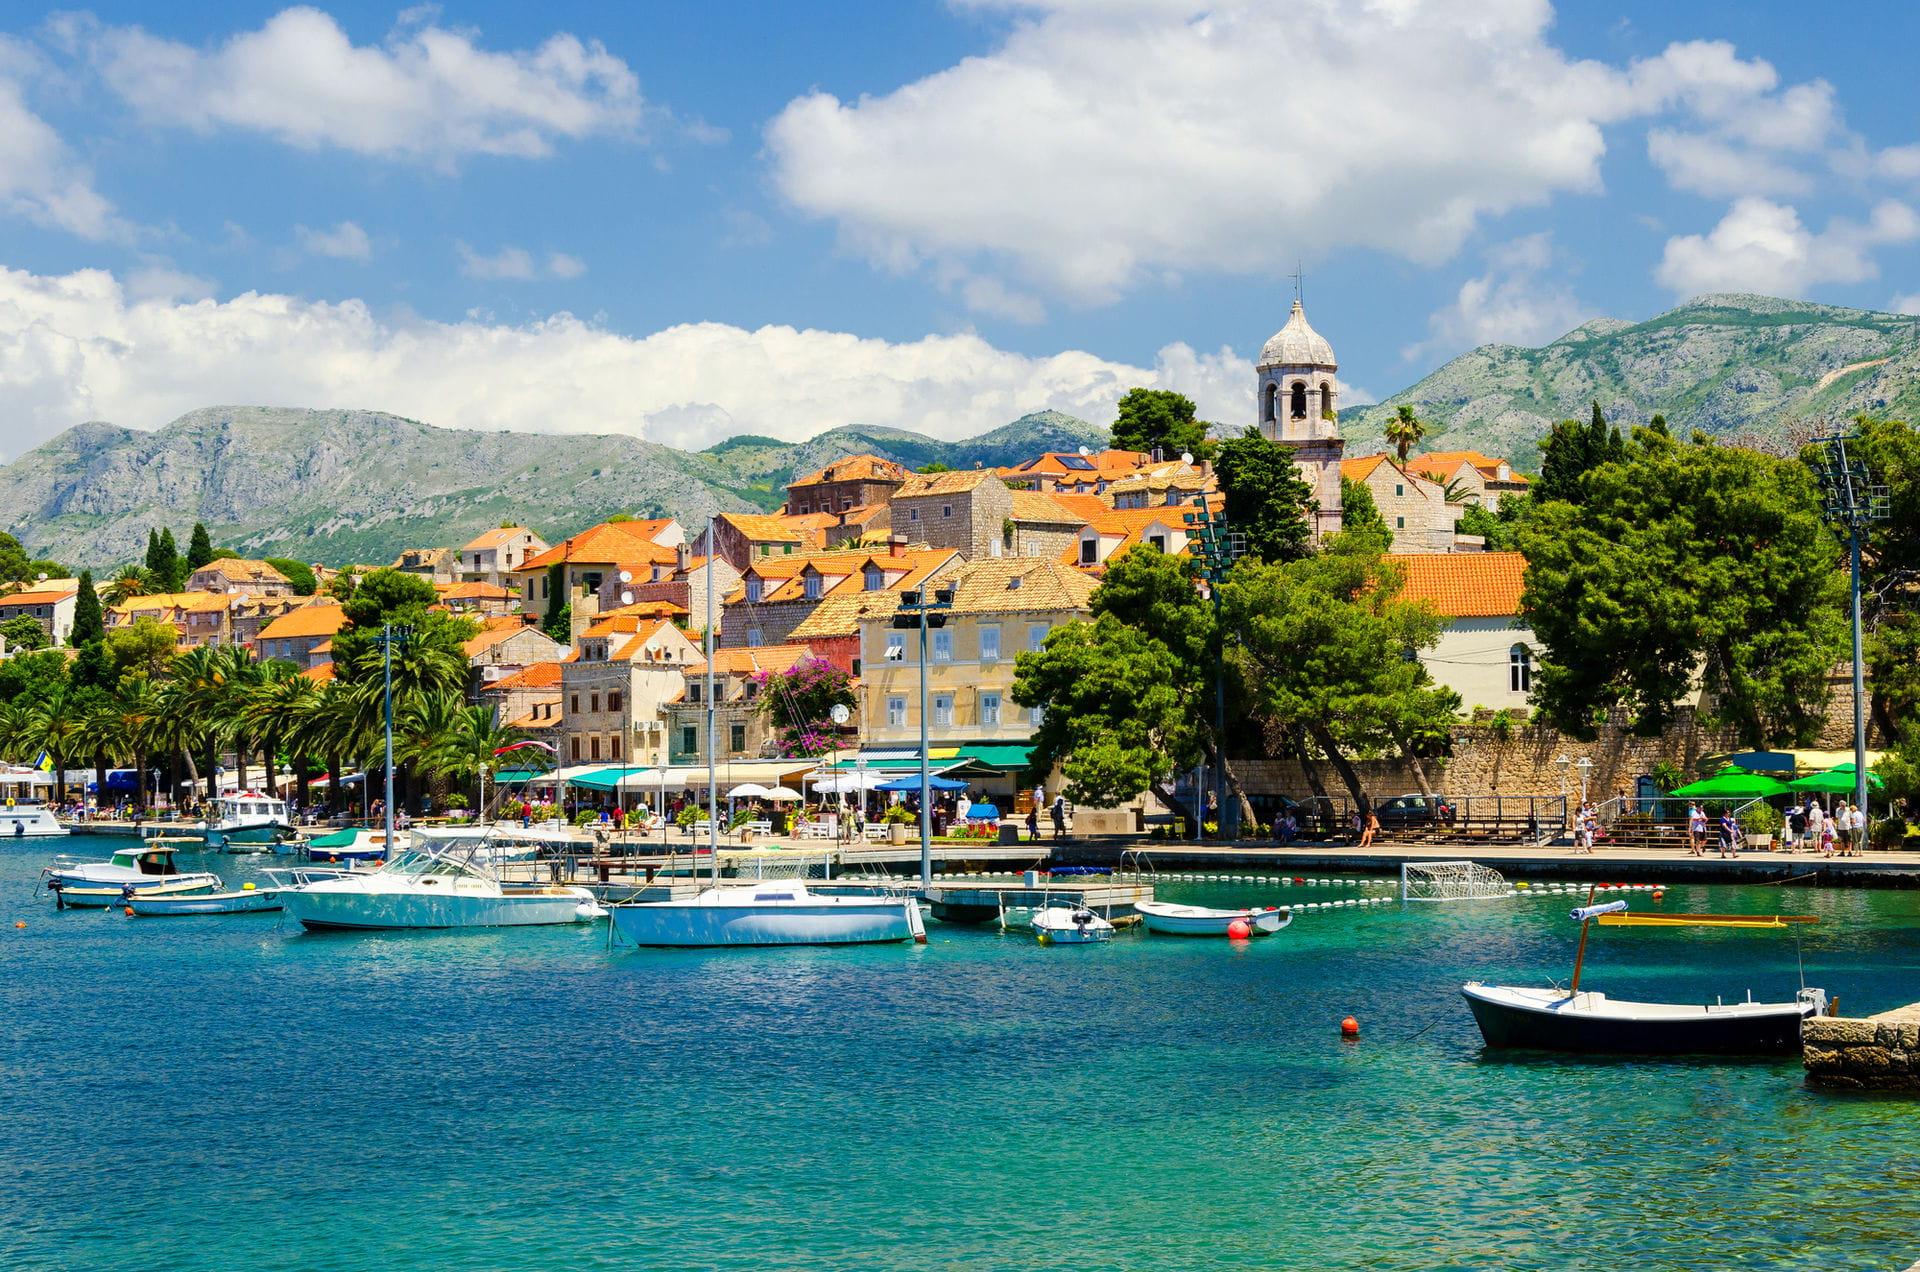 High quality hoto of Cavtat - Croatia